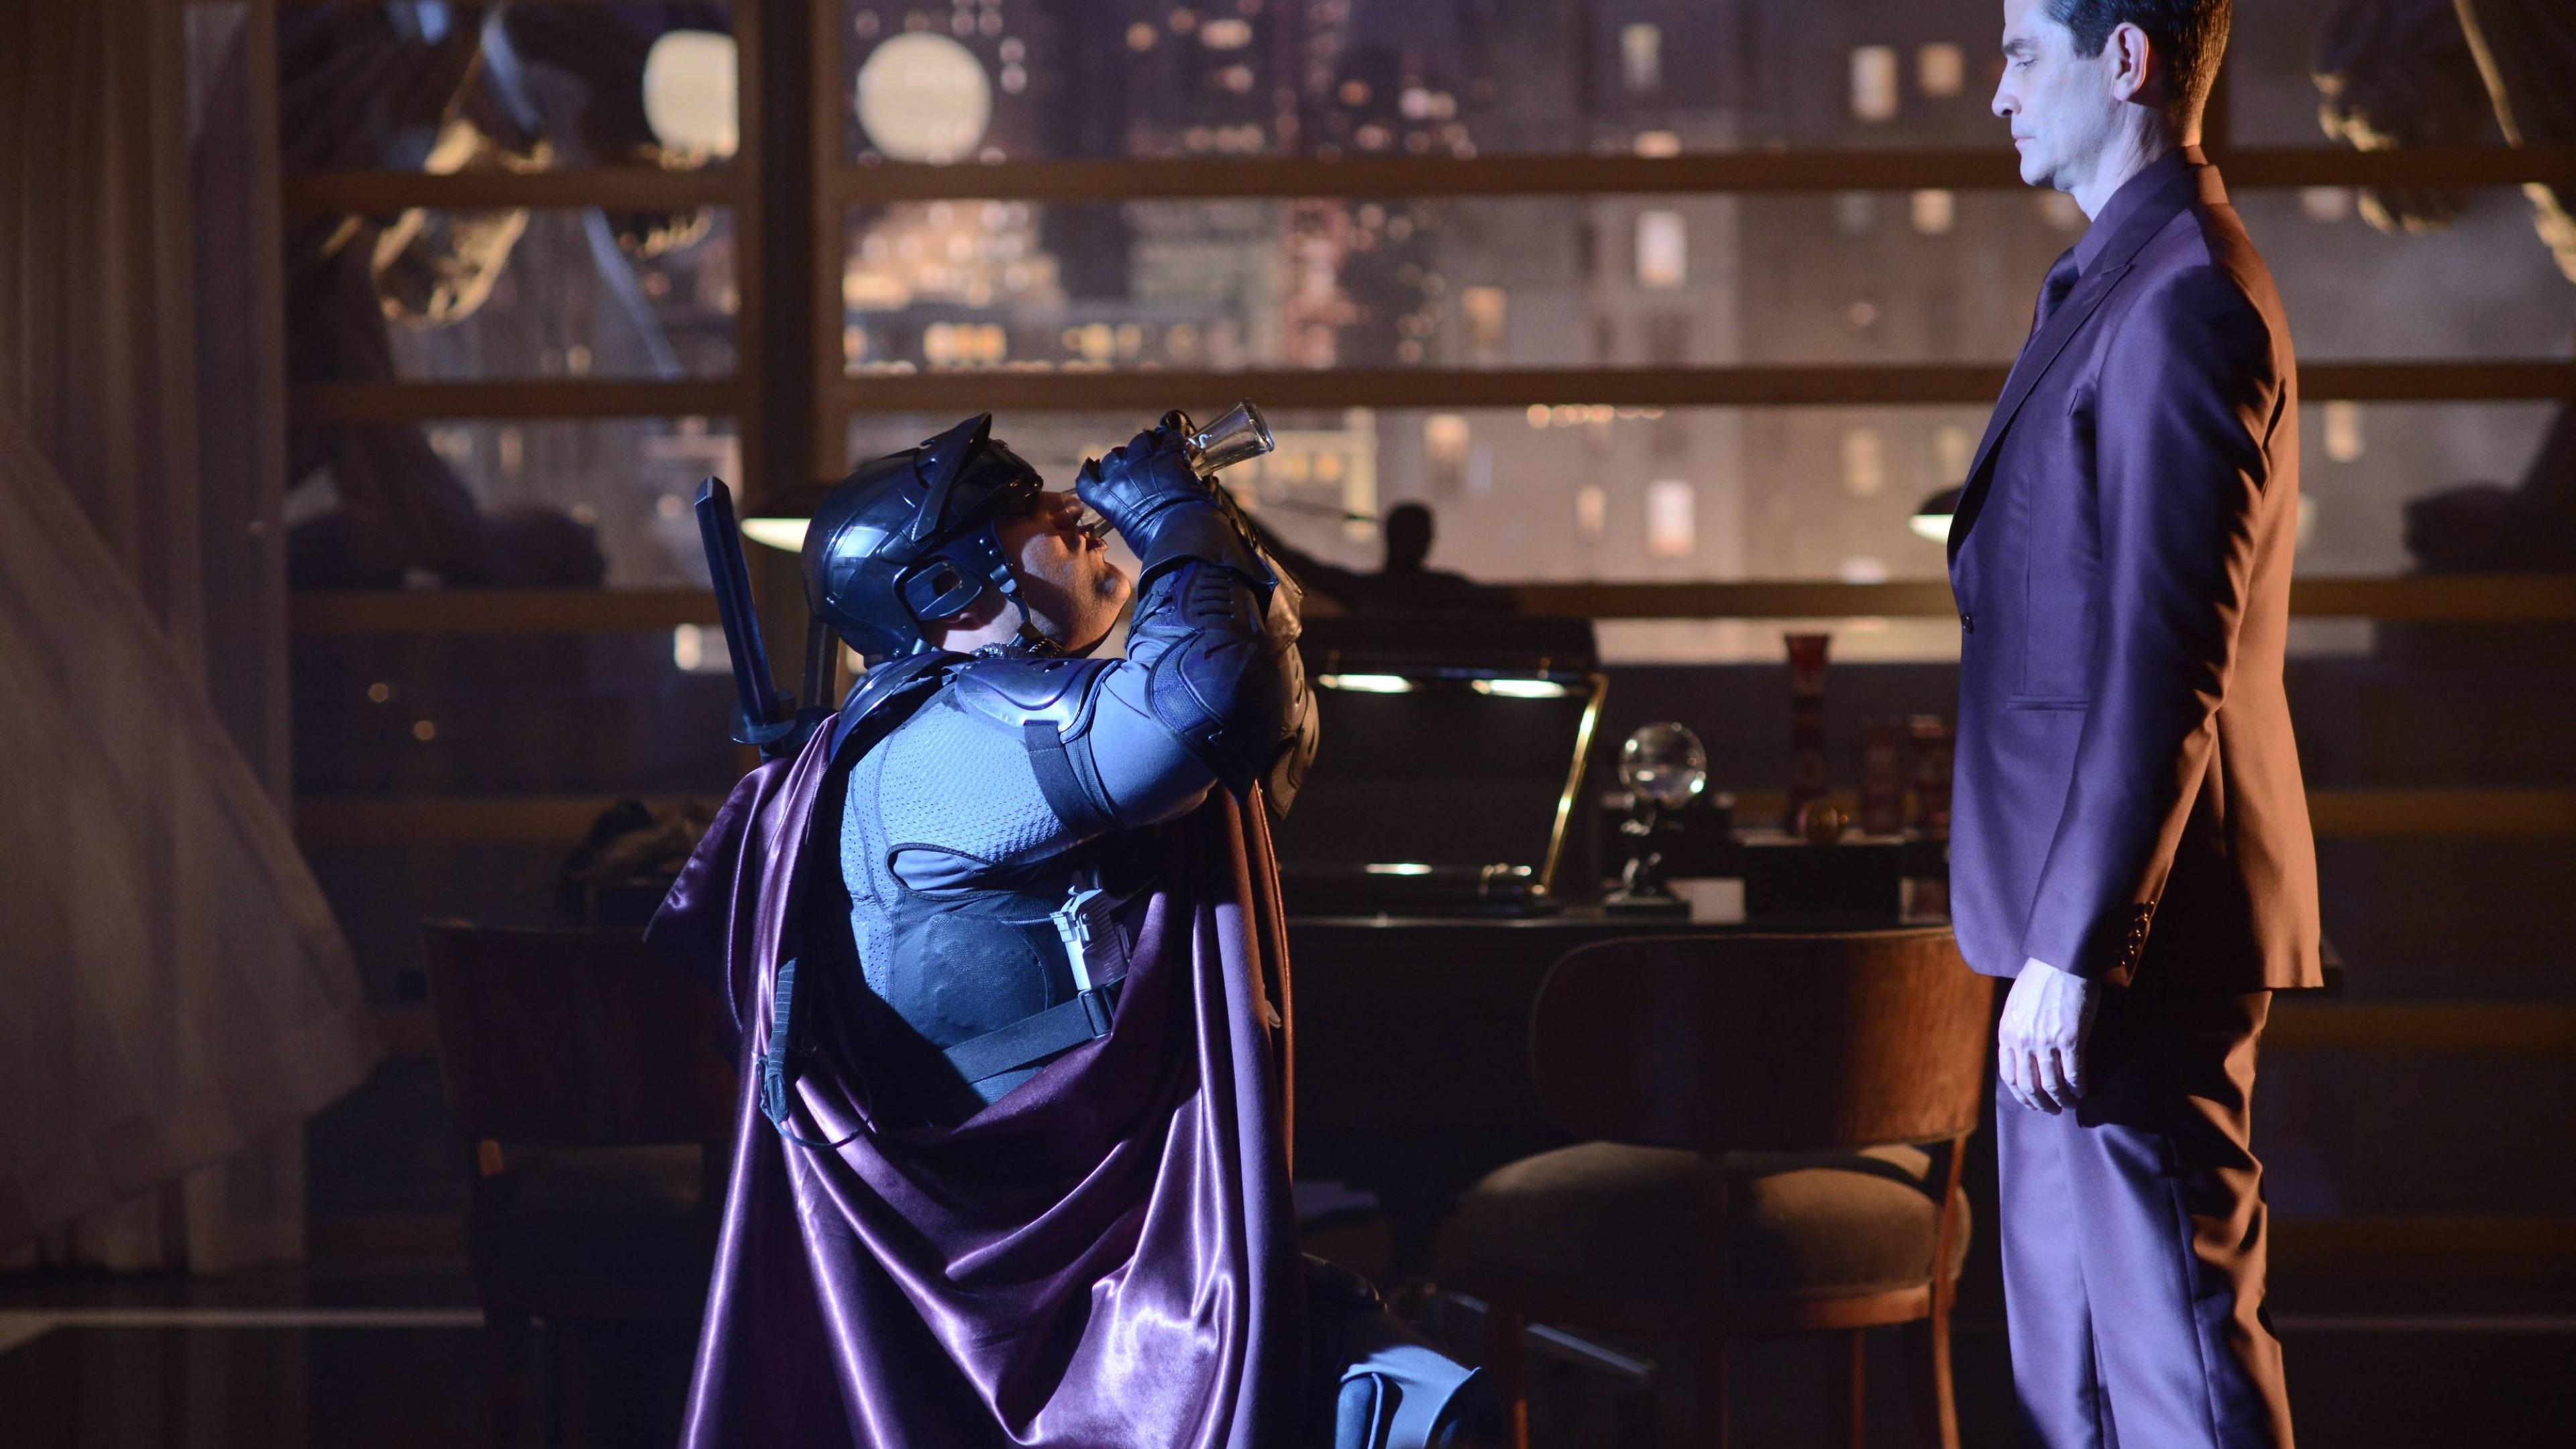 Wallpaper Gotham 2 season, Gotham, TV Series, crime, Movies